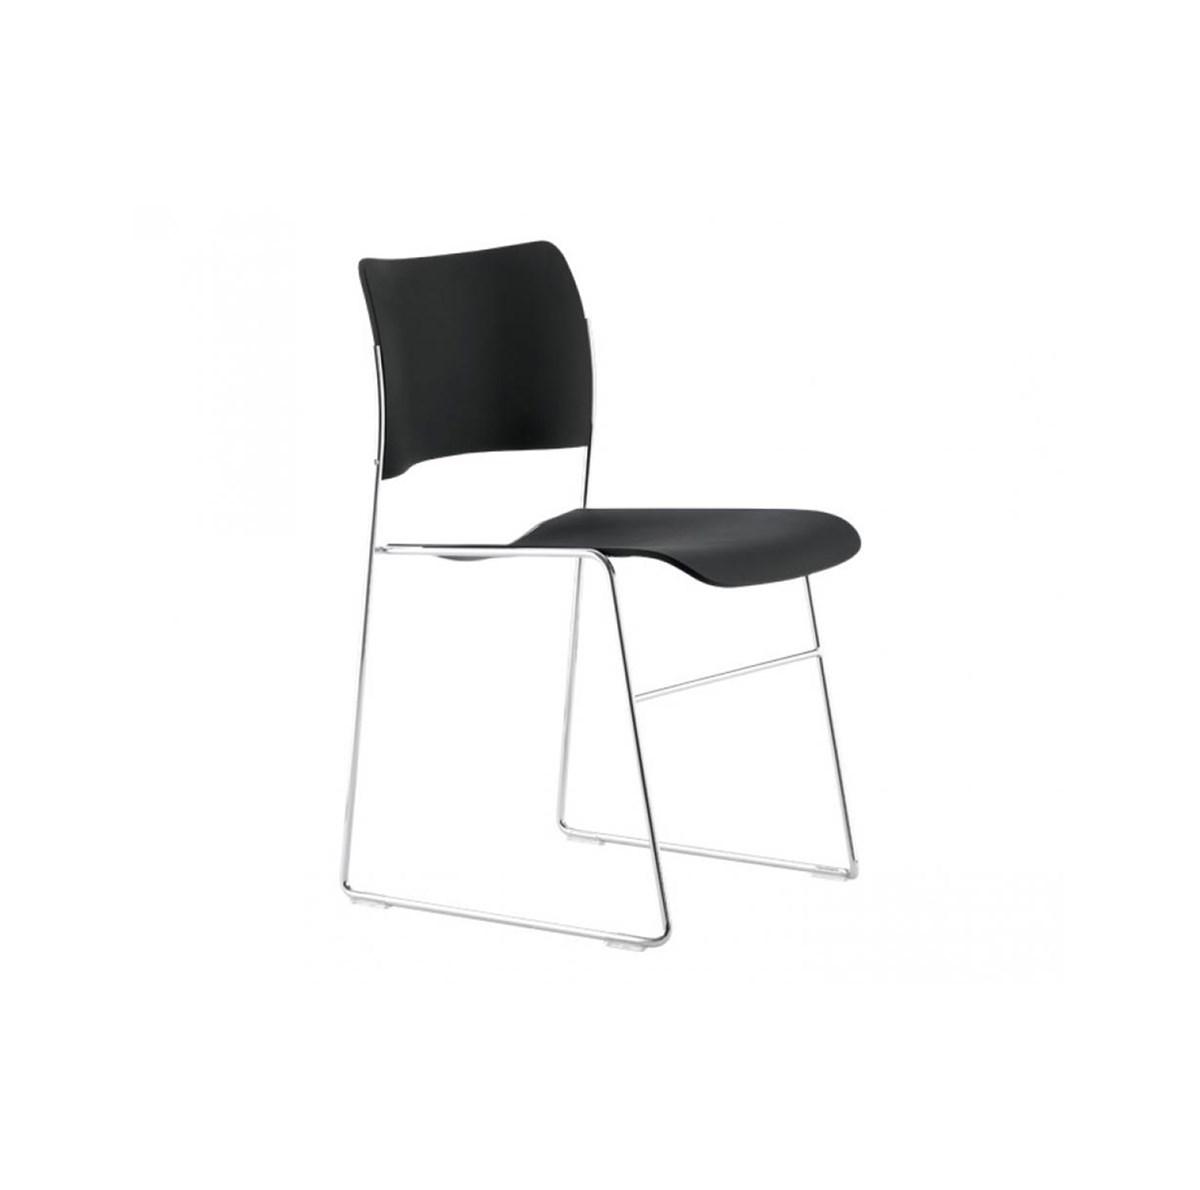 Howe-David-Rowland-40/4-Chair-Matisse-1